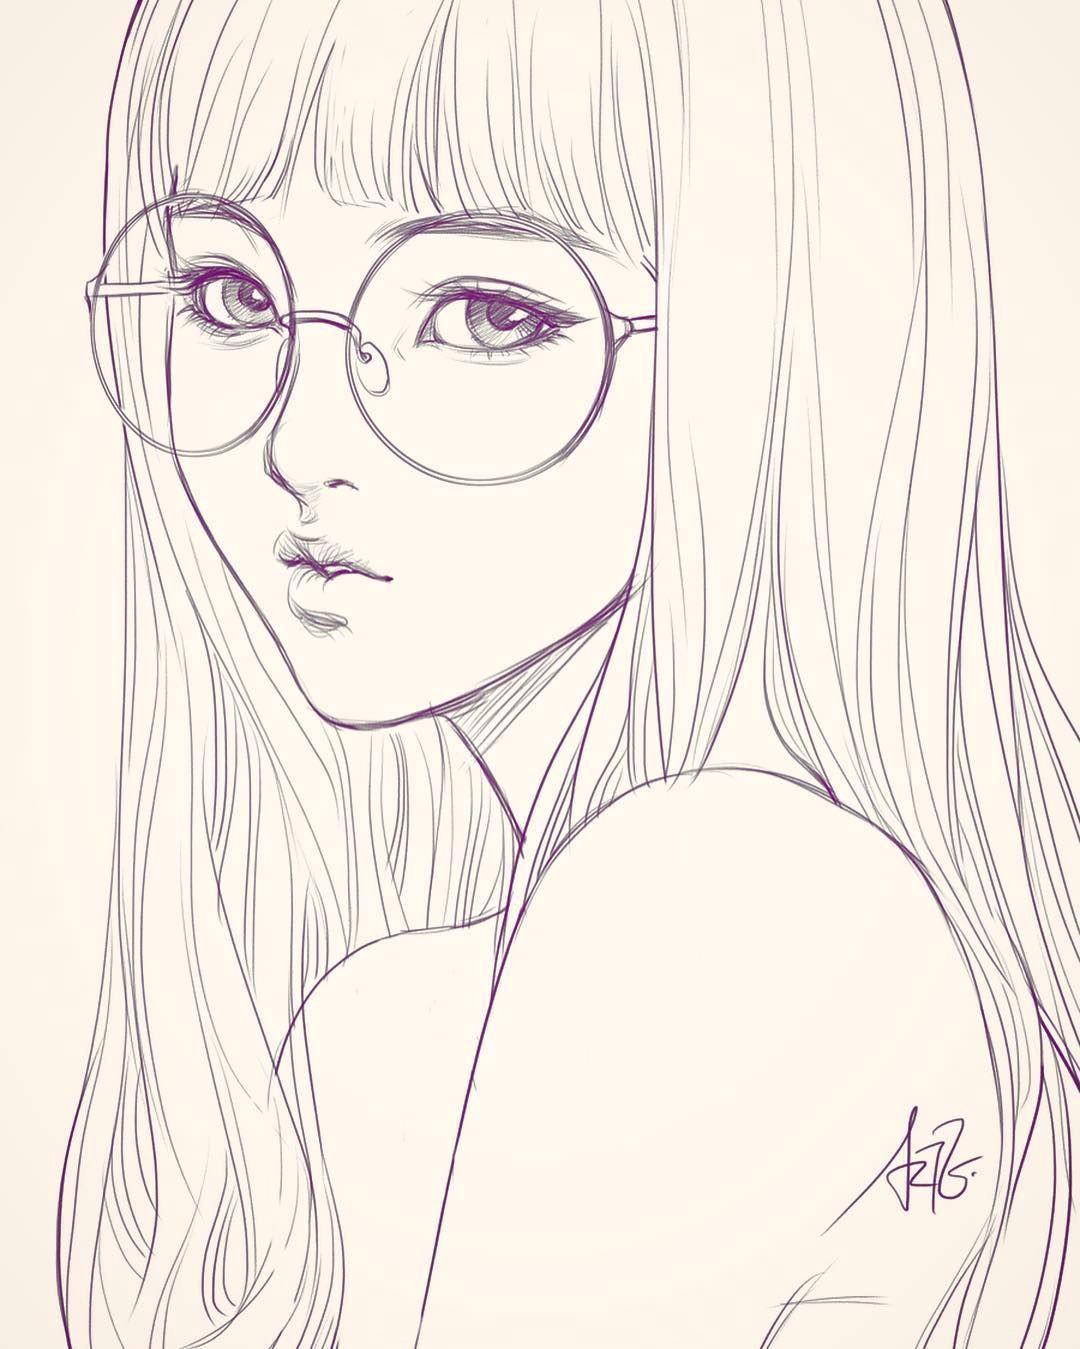 Drawing Manga Girl Eyes Last Sketch Of Girl with Glasses Having Bad Backache It Hurts